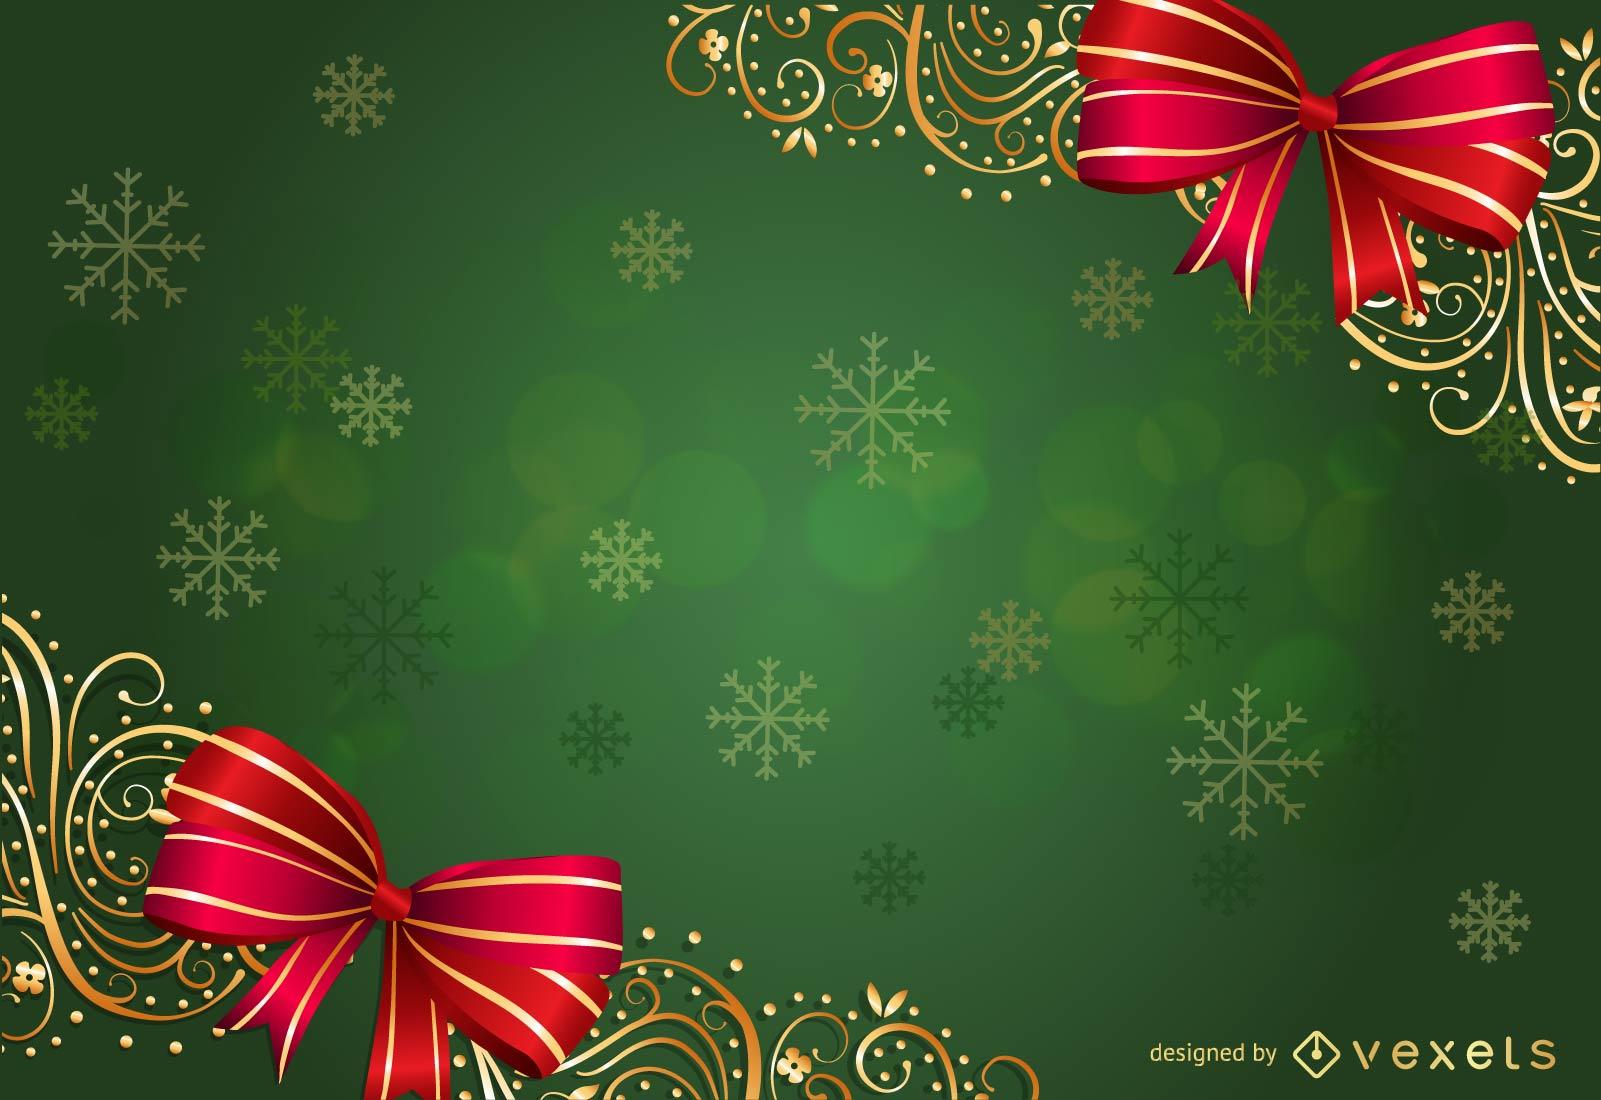 Beautiful Christmas Background Images.Beautiful Christmas Background Vector Download